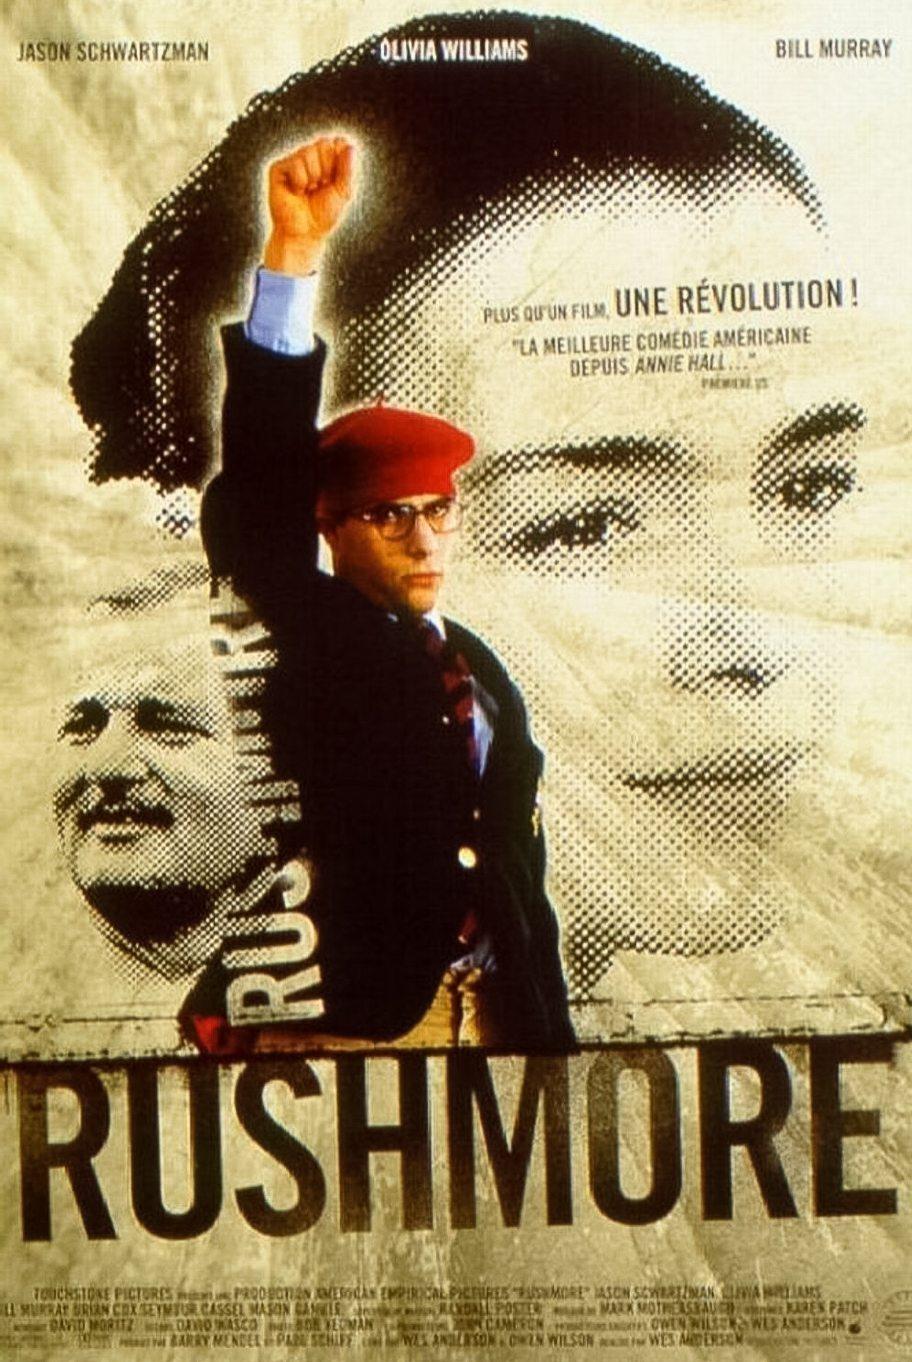 Rushmore [VoicesFILM.com] [912 x 1363] (1)